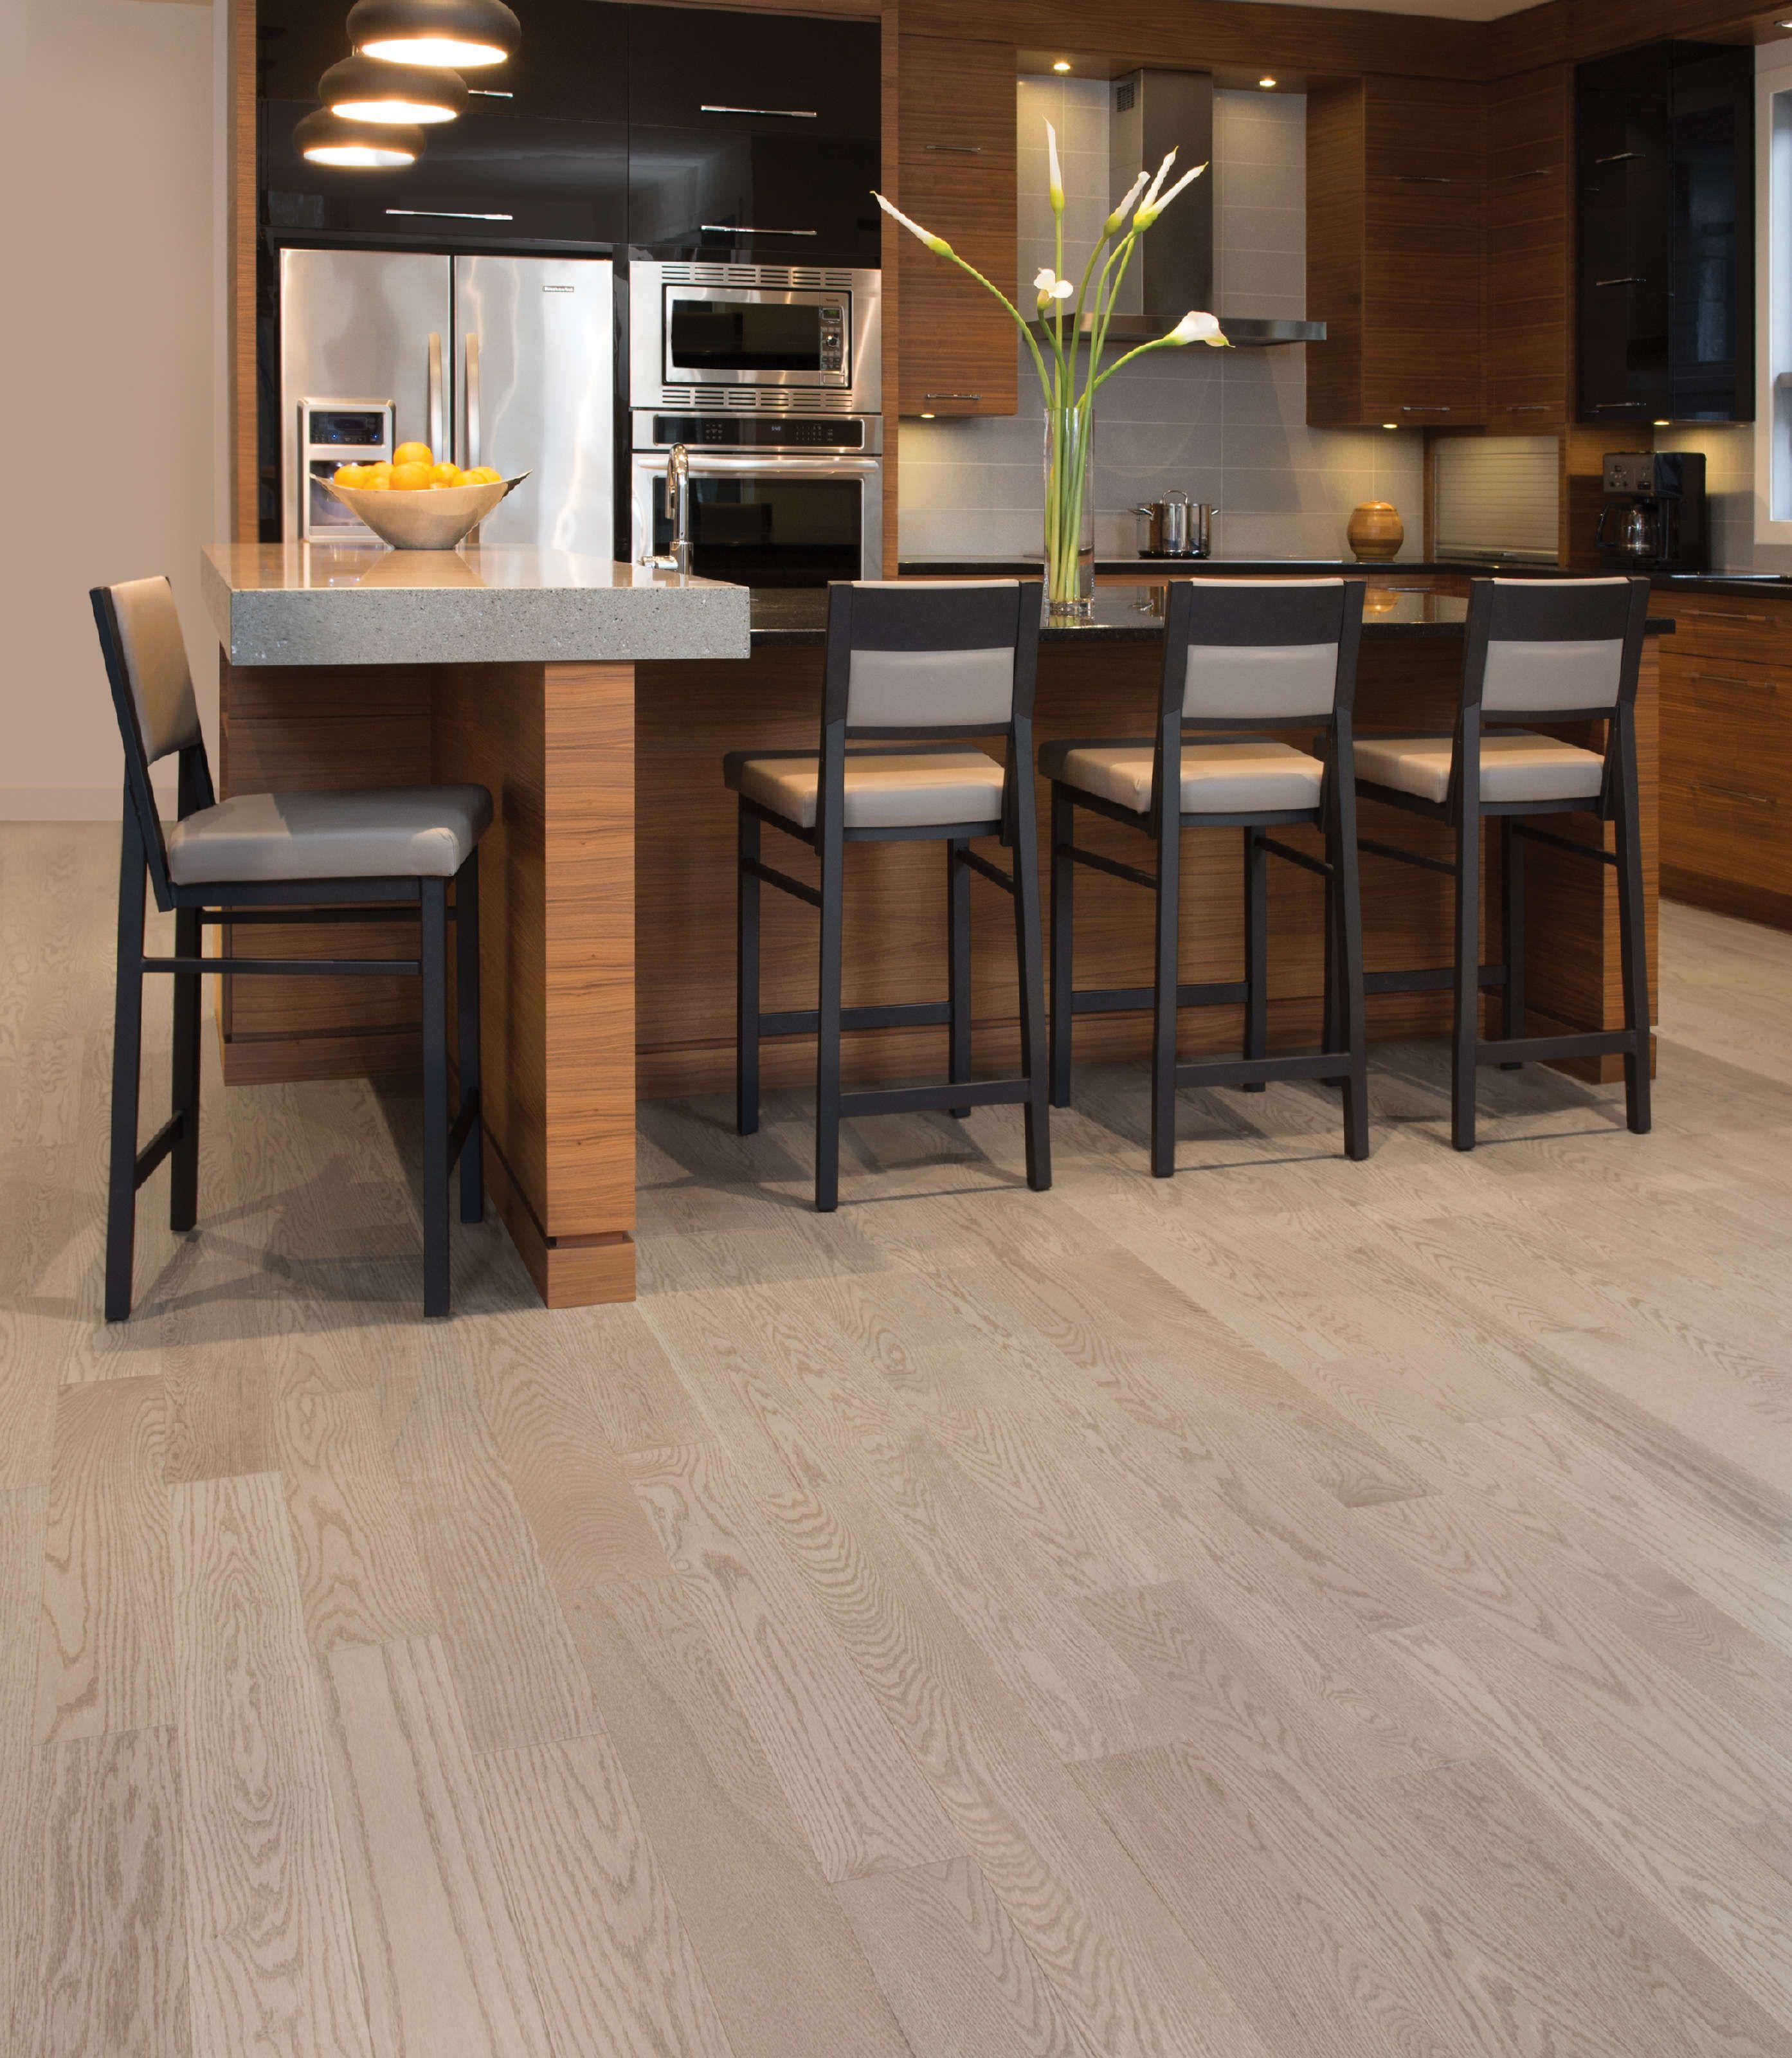 Red Flooring Kitchen: Oak Hardwood Flooring, Hardwood